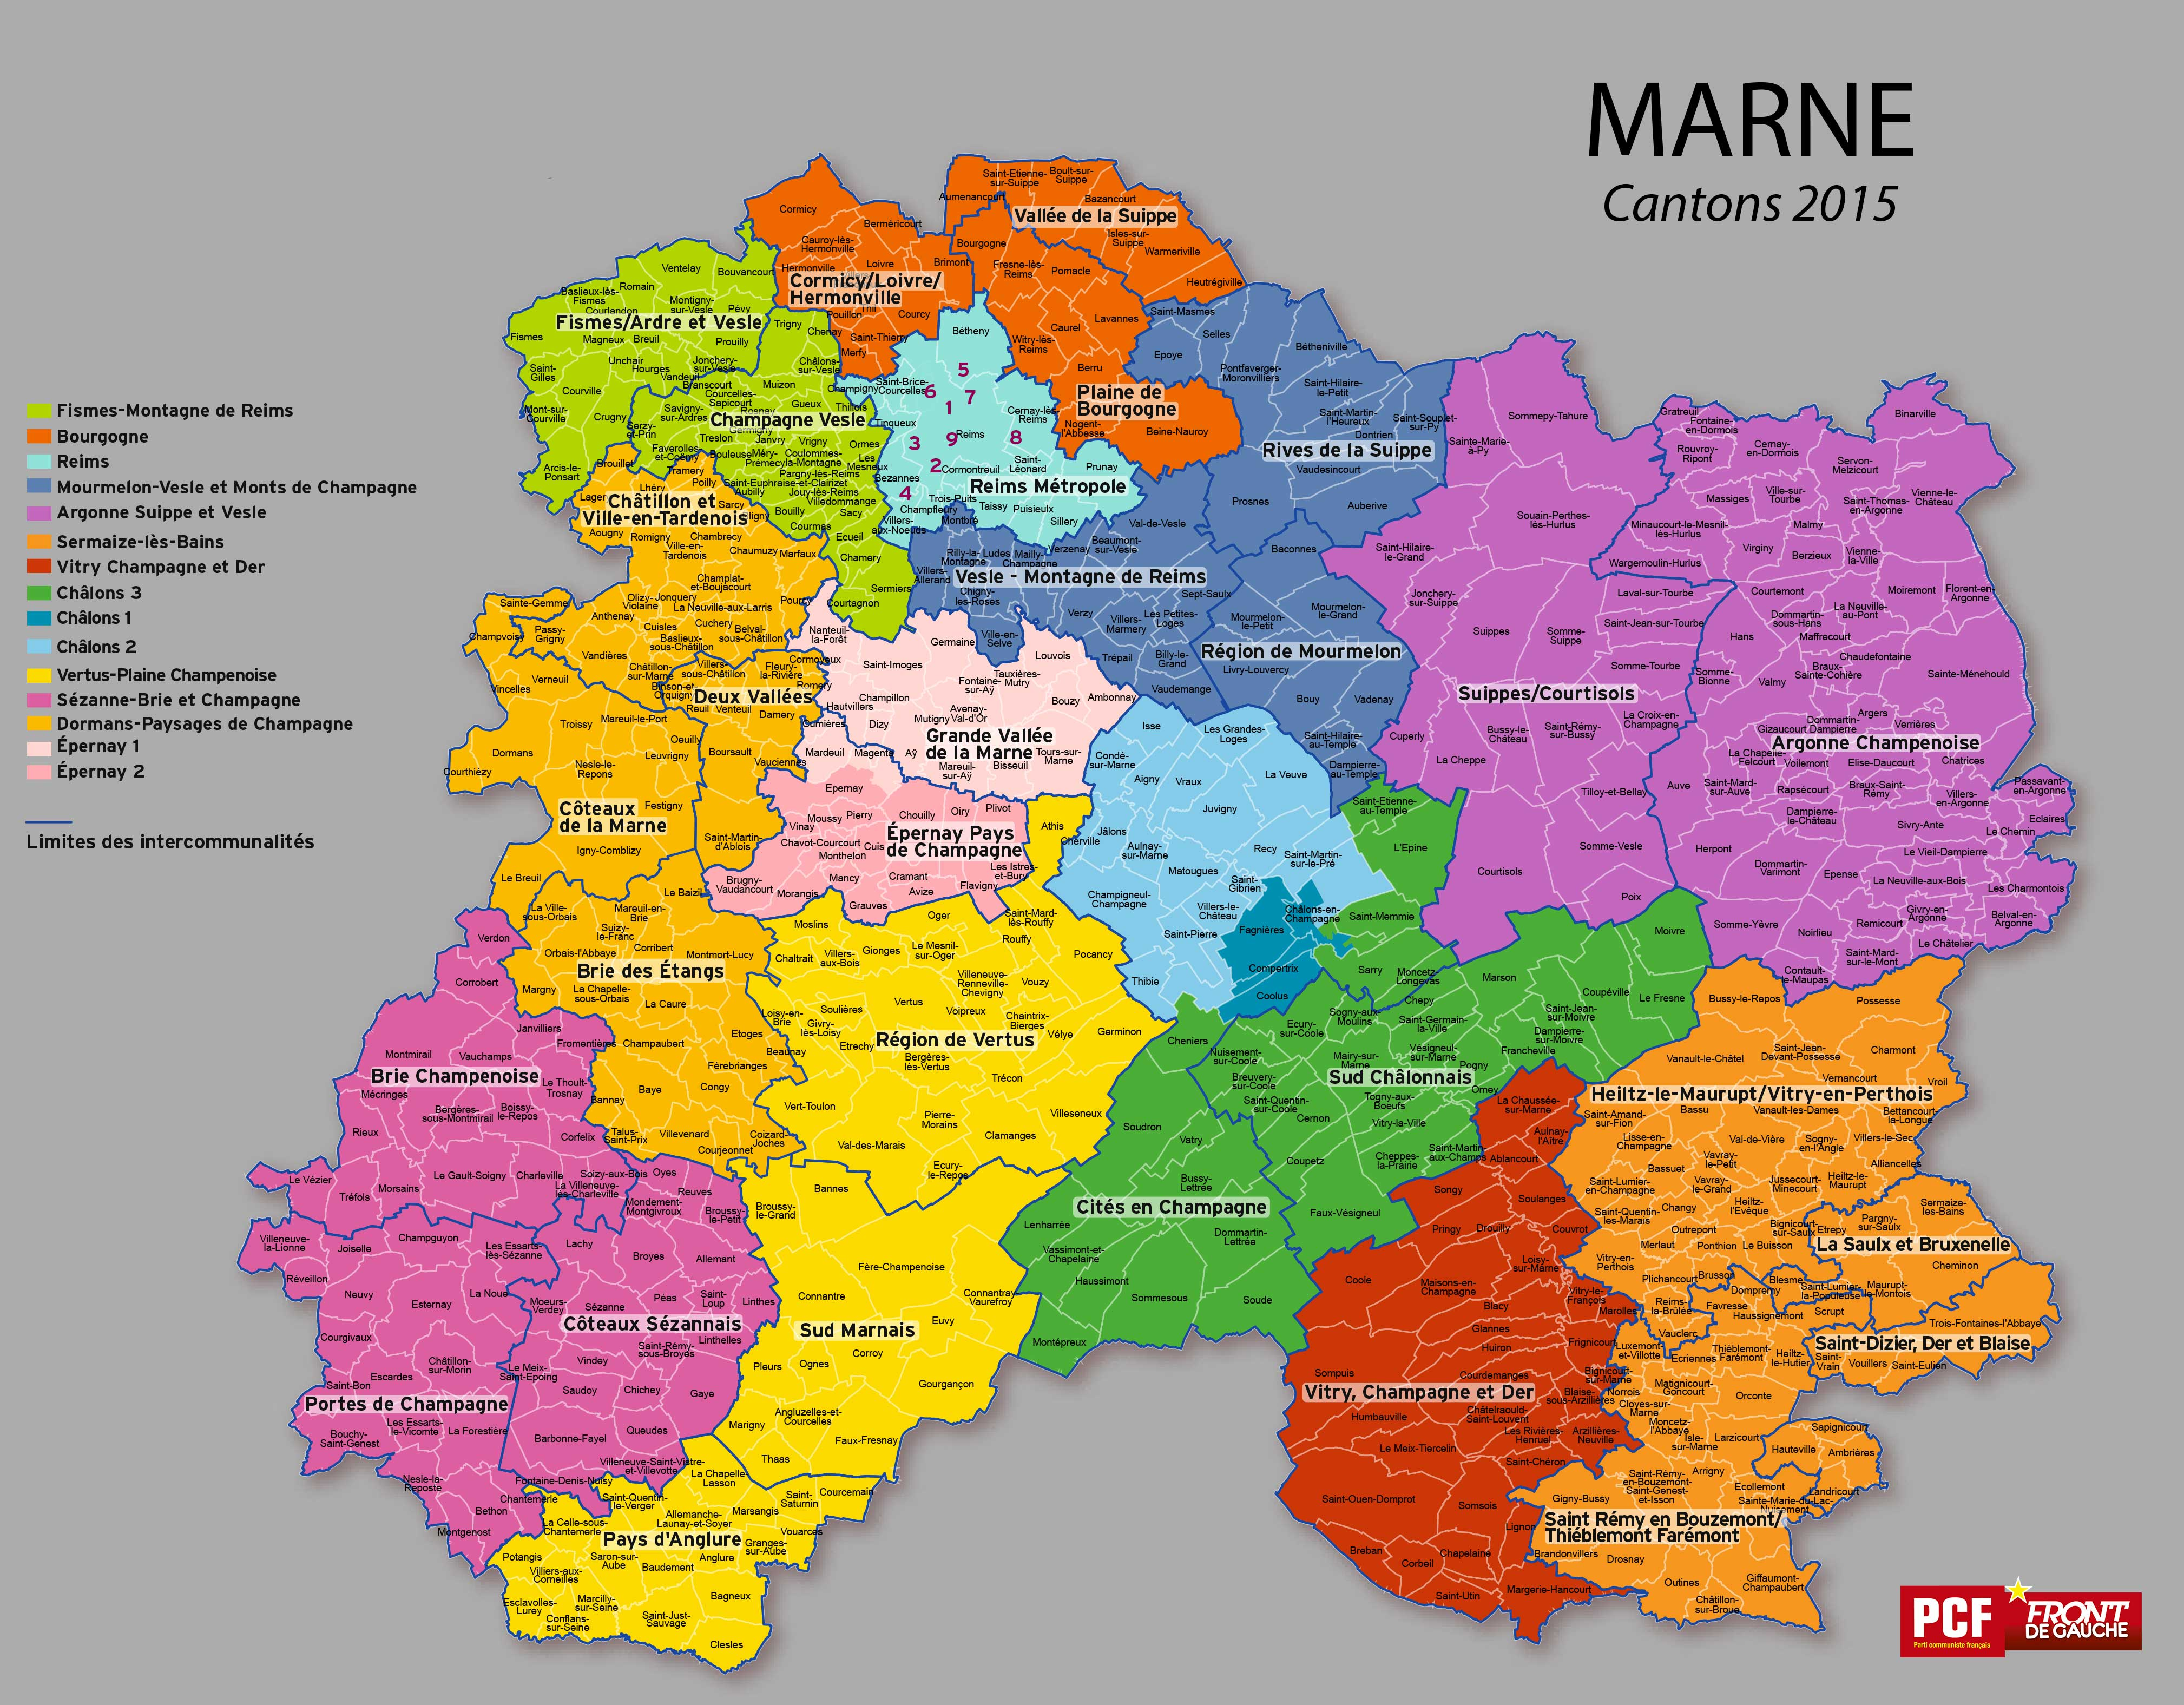 Carte des cantons de la Marne